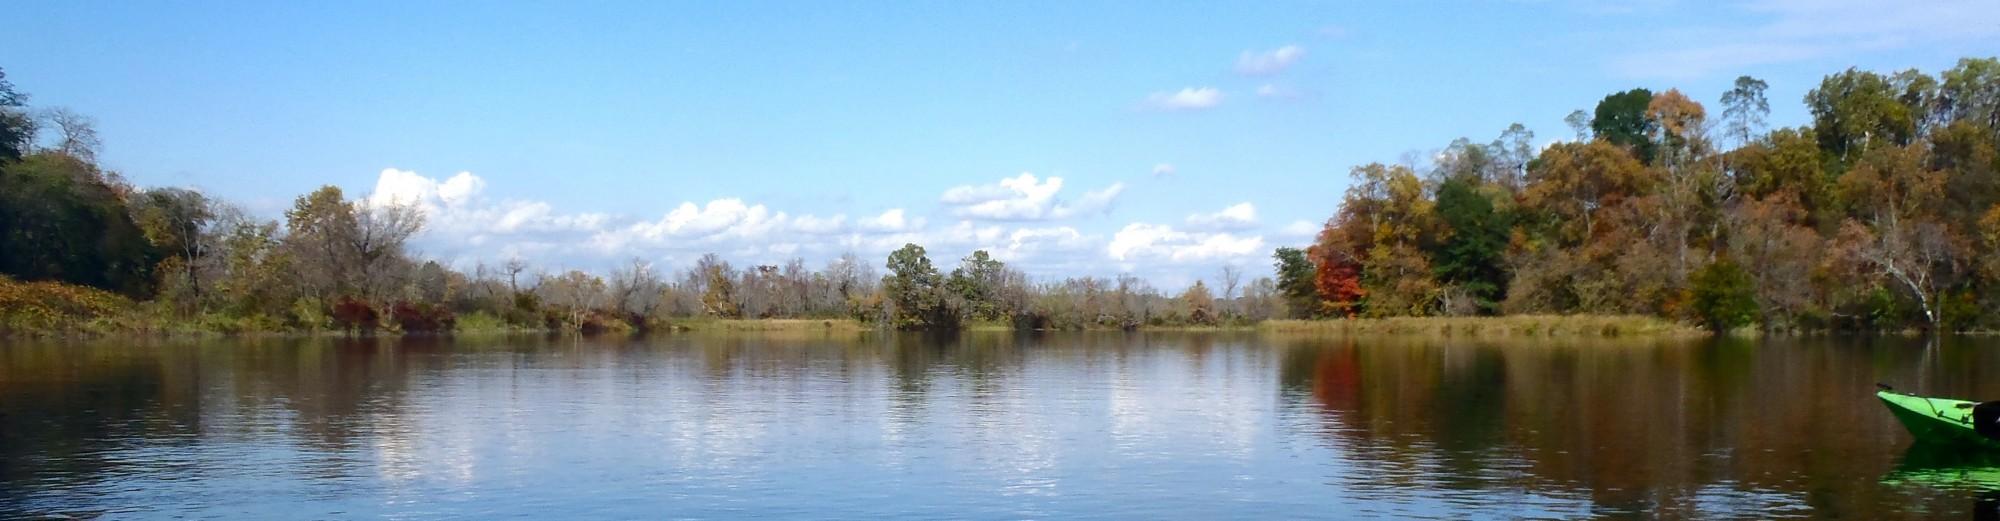 Bordentown City Environmental Commission